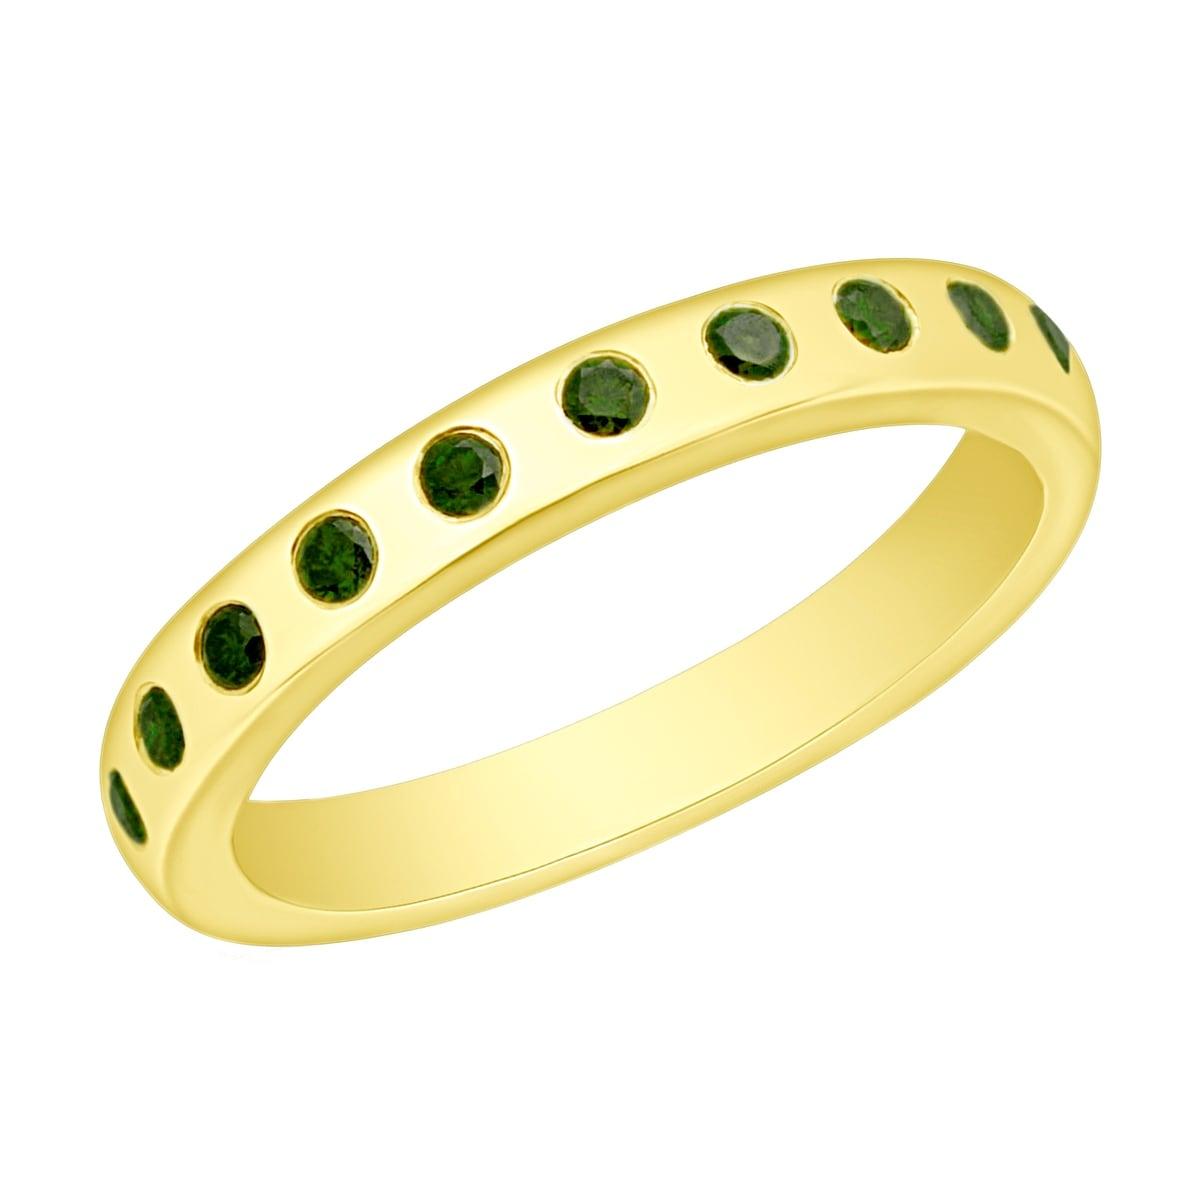 Prism Jewel 0.25CT Flush Set Round Cut Green Diamond Wedding Band - Thumbnail 0